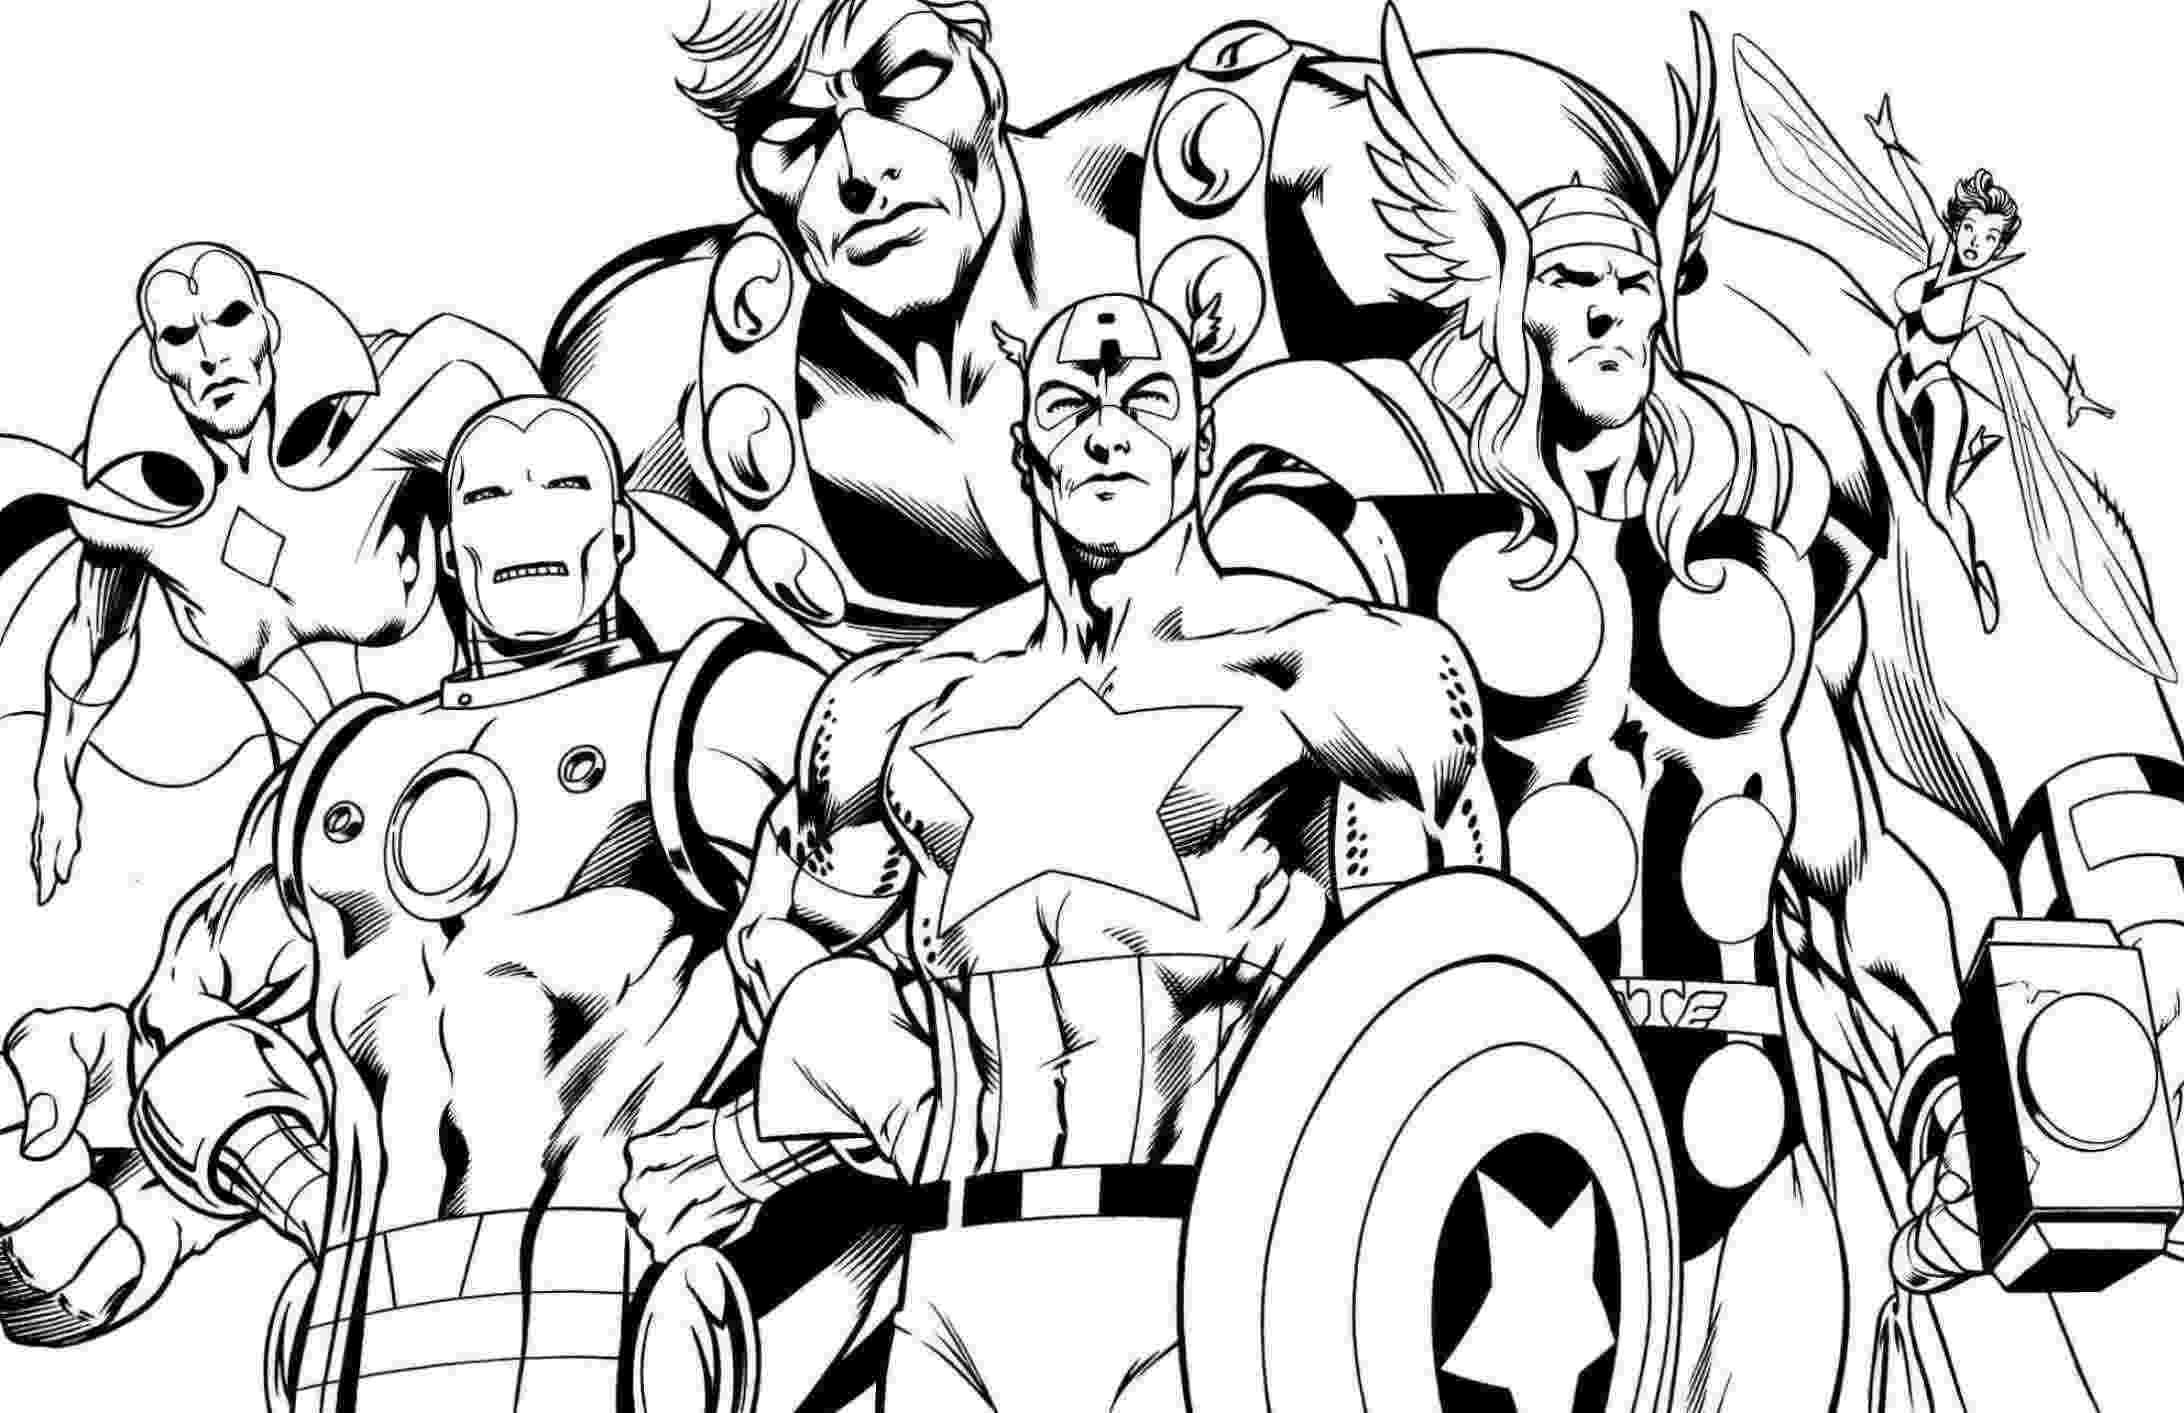 avengers coloring sheet superhero coloring pages best coloring pages for kids sheet coloring avengers